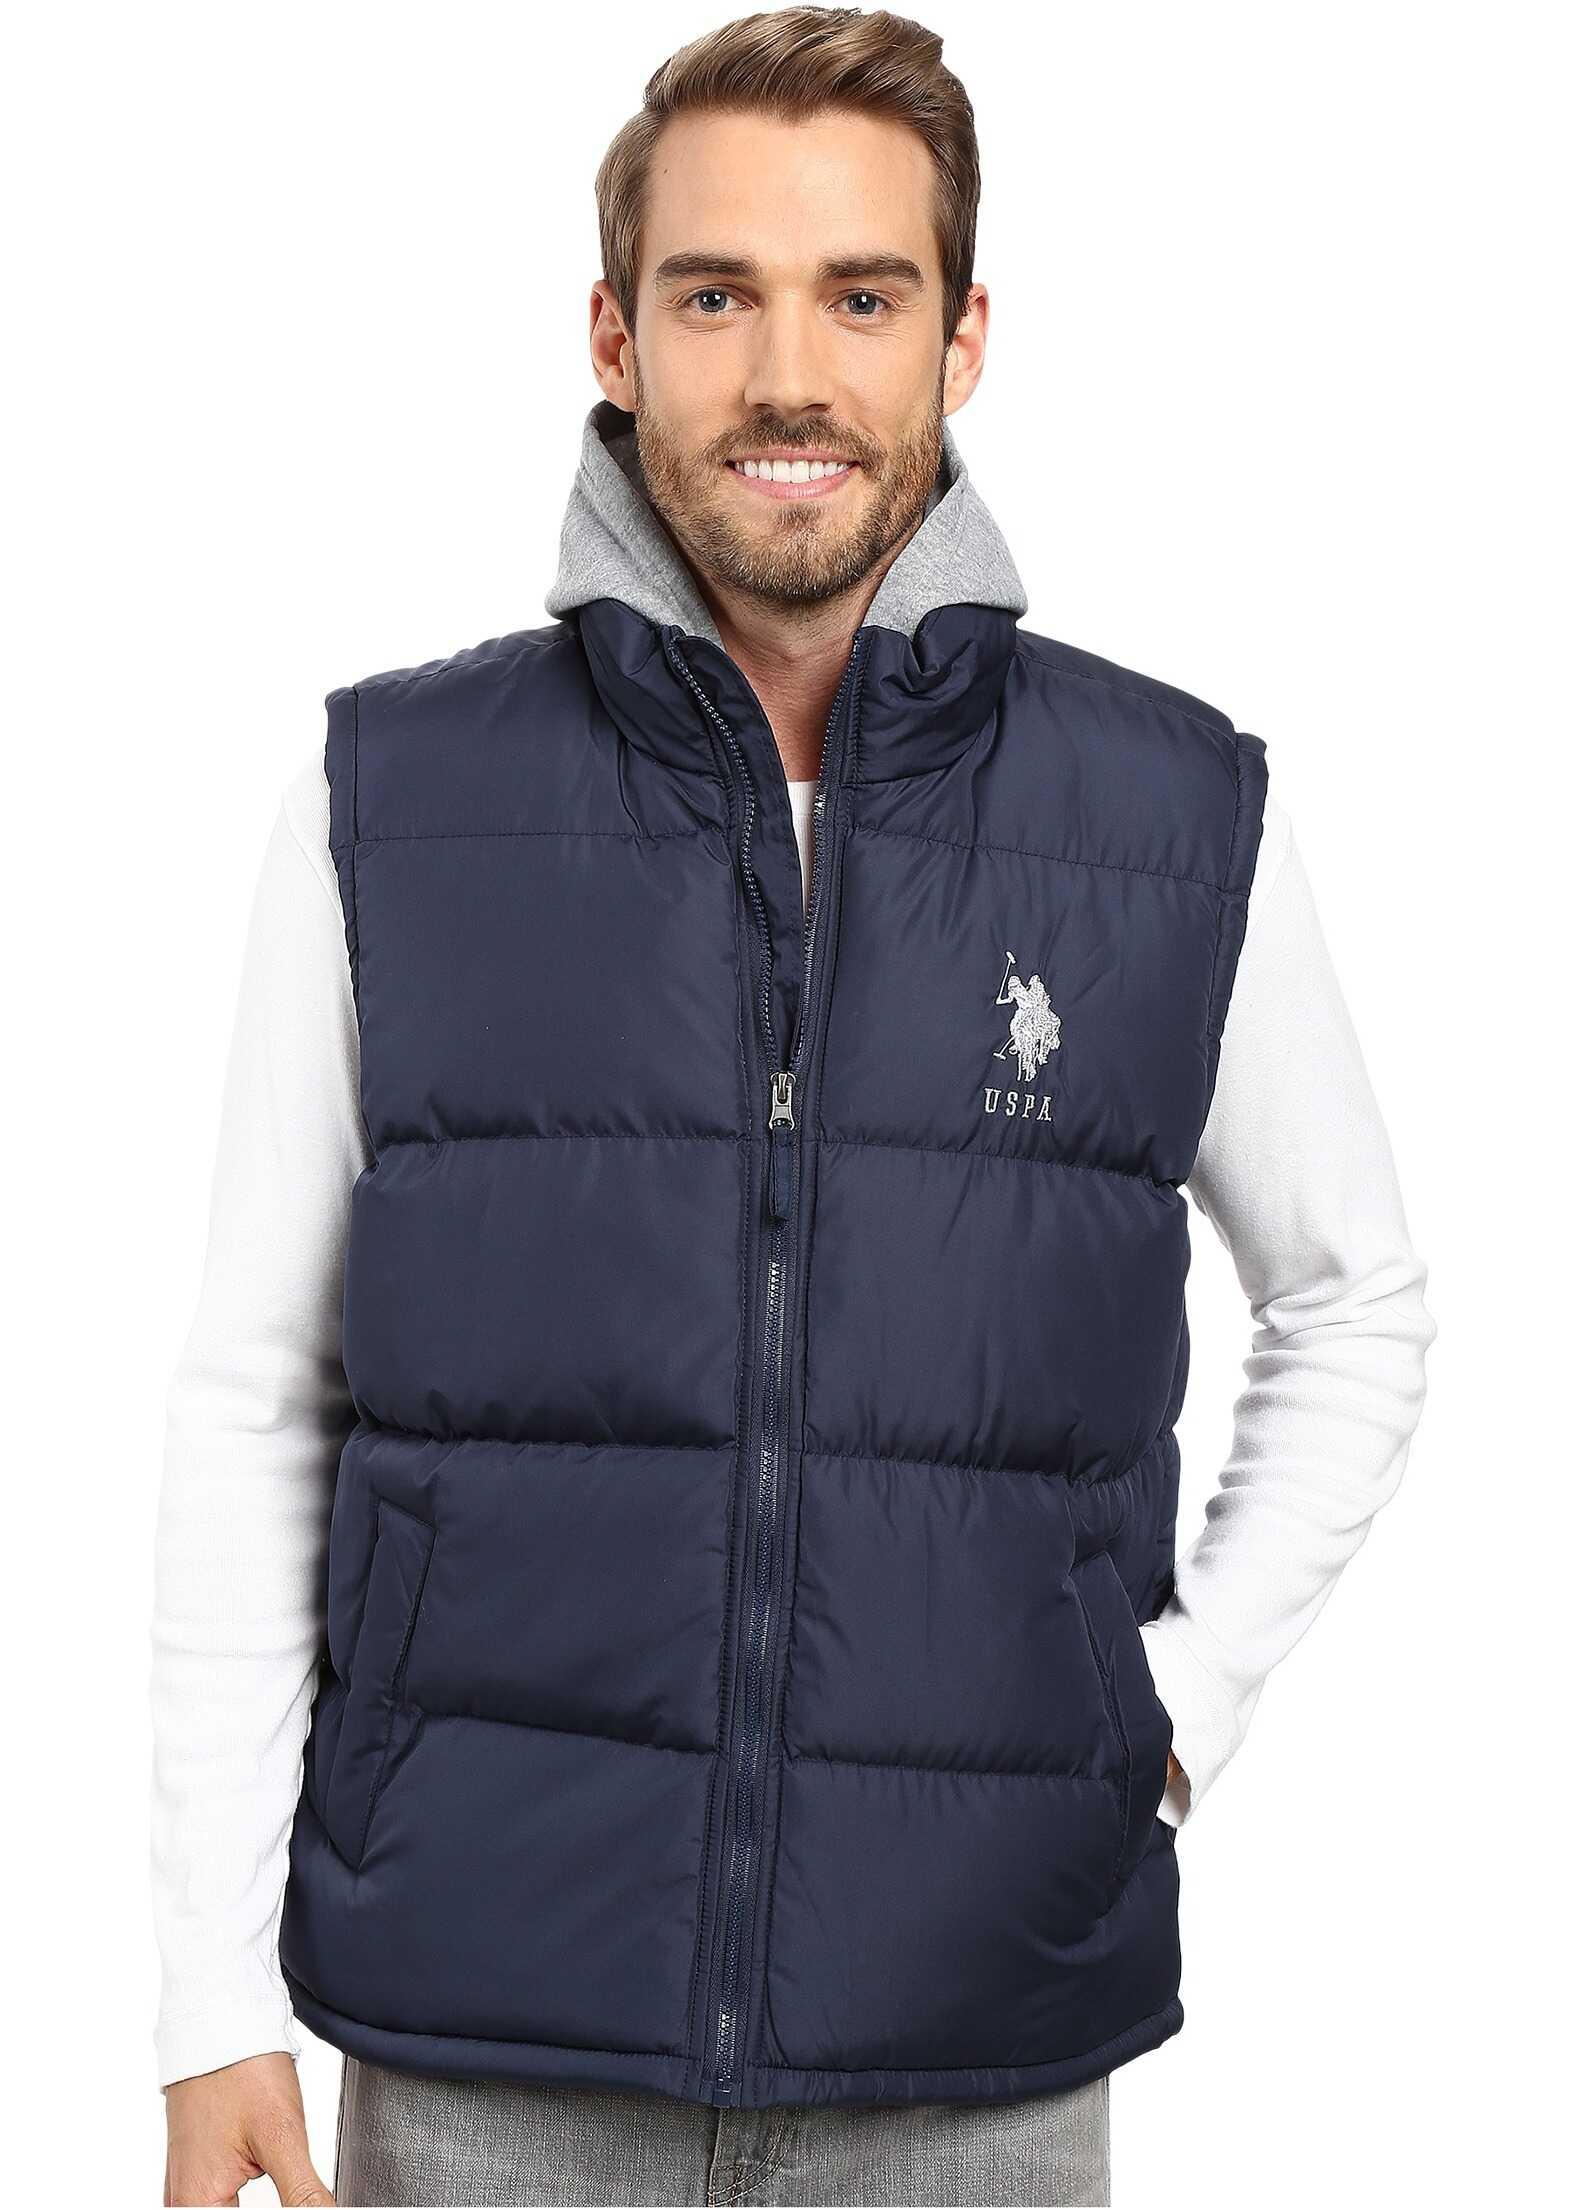 U.S. POLO ASSN. Basic Puffer Vest with Fleece Hood Classic Navy